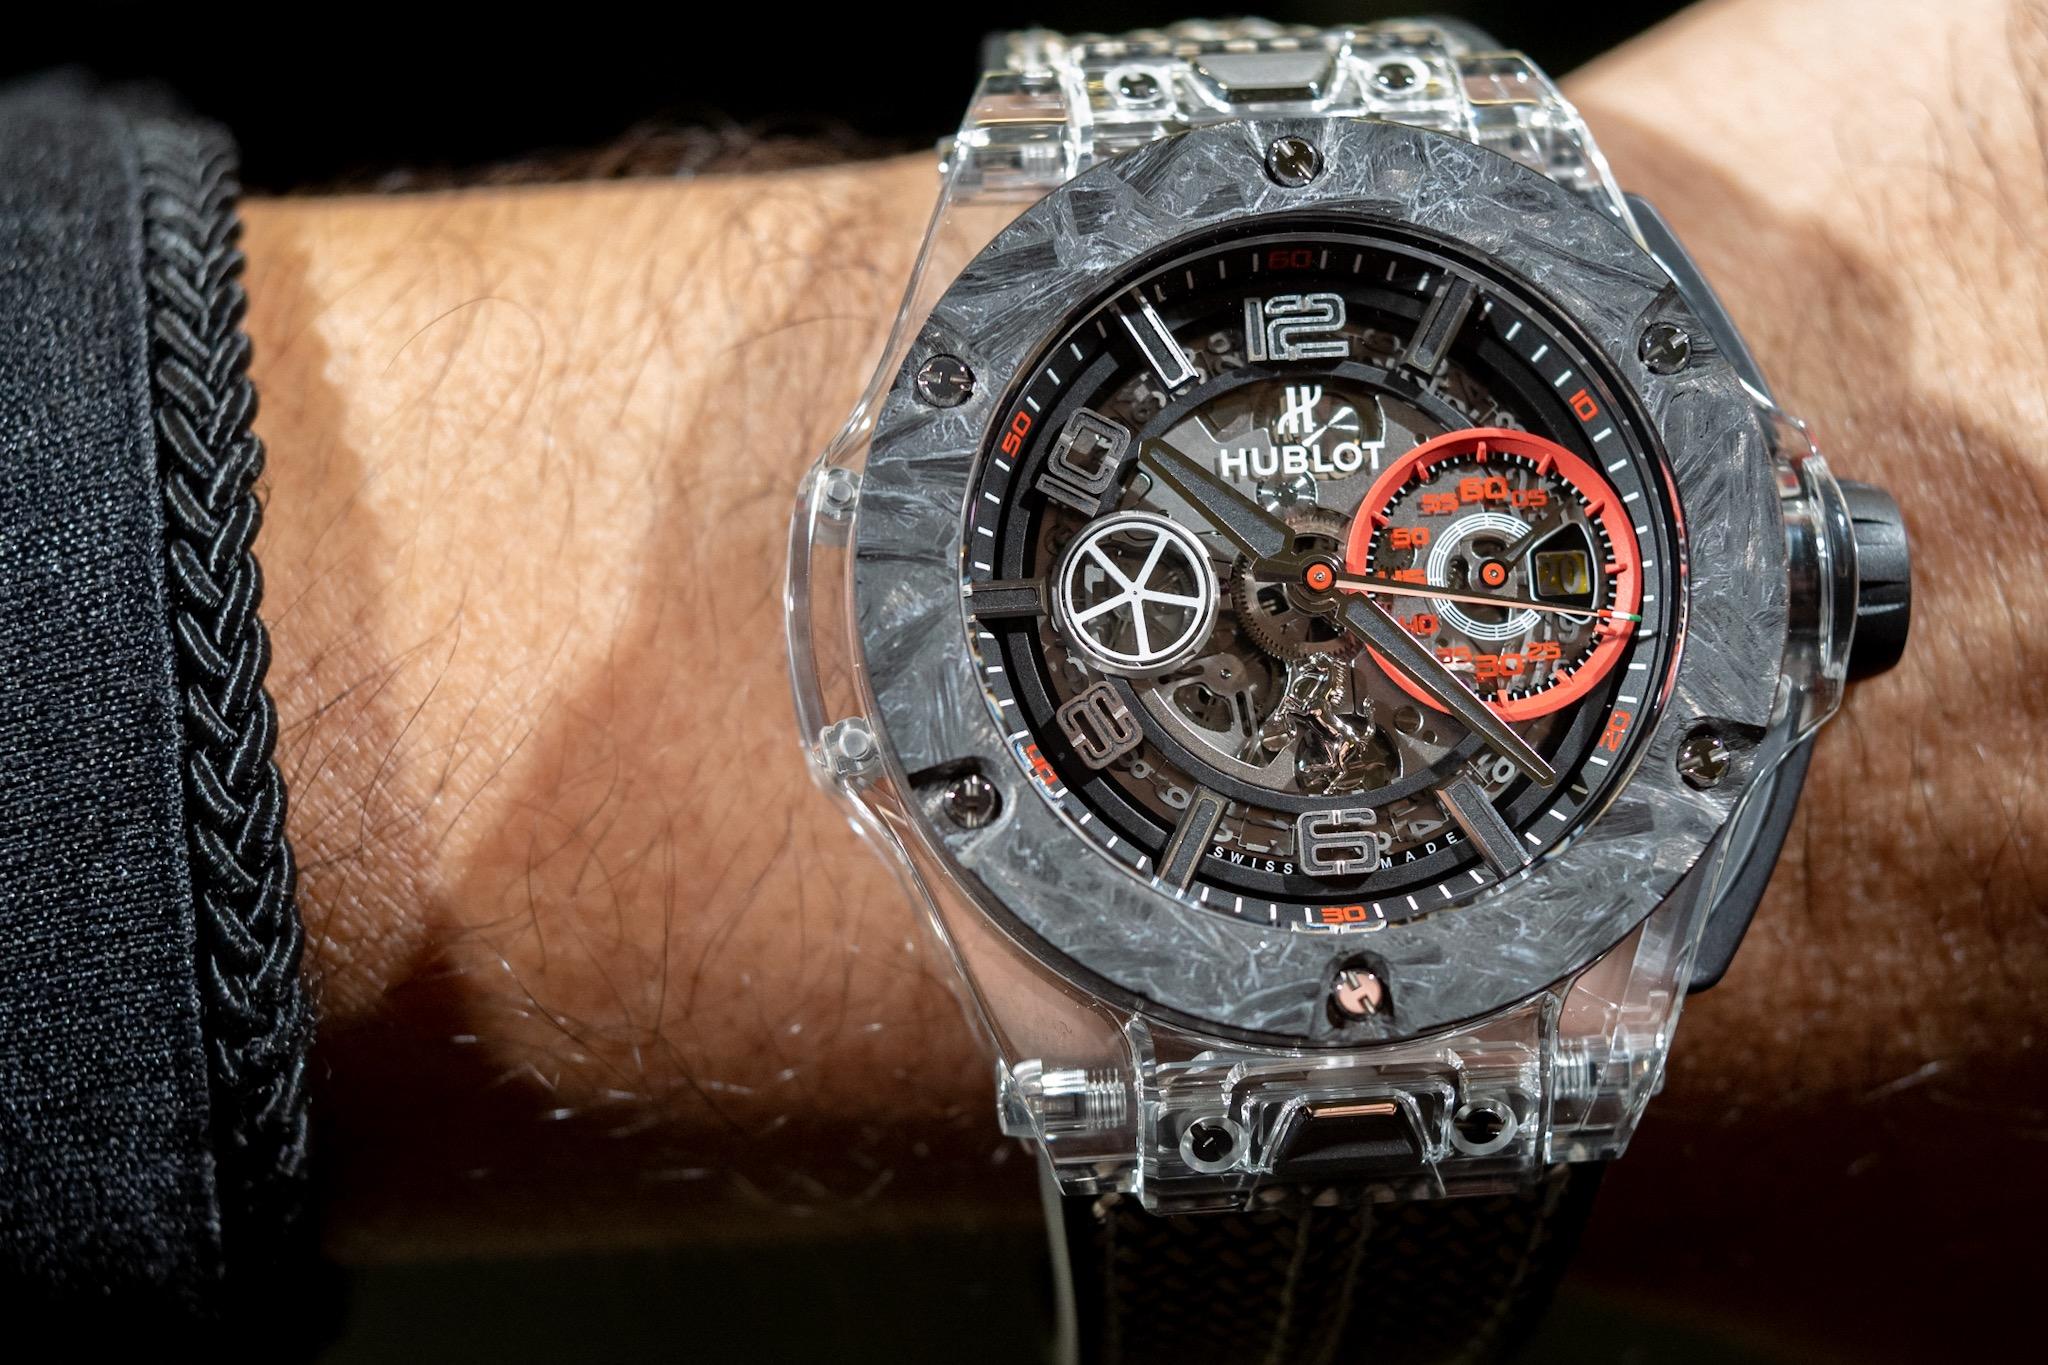 Big Bang Scuderia Ferrari 90th Anniversary watch in sapphire